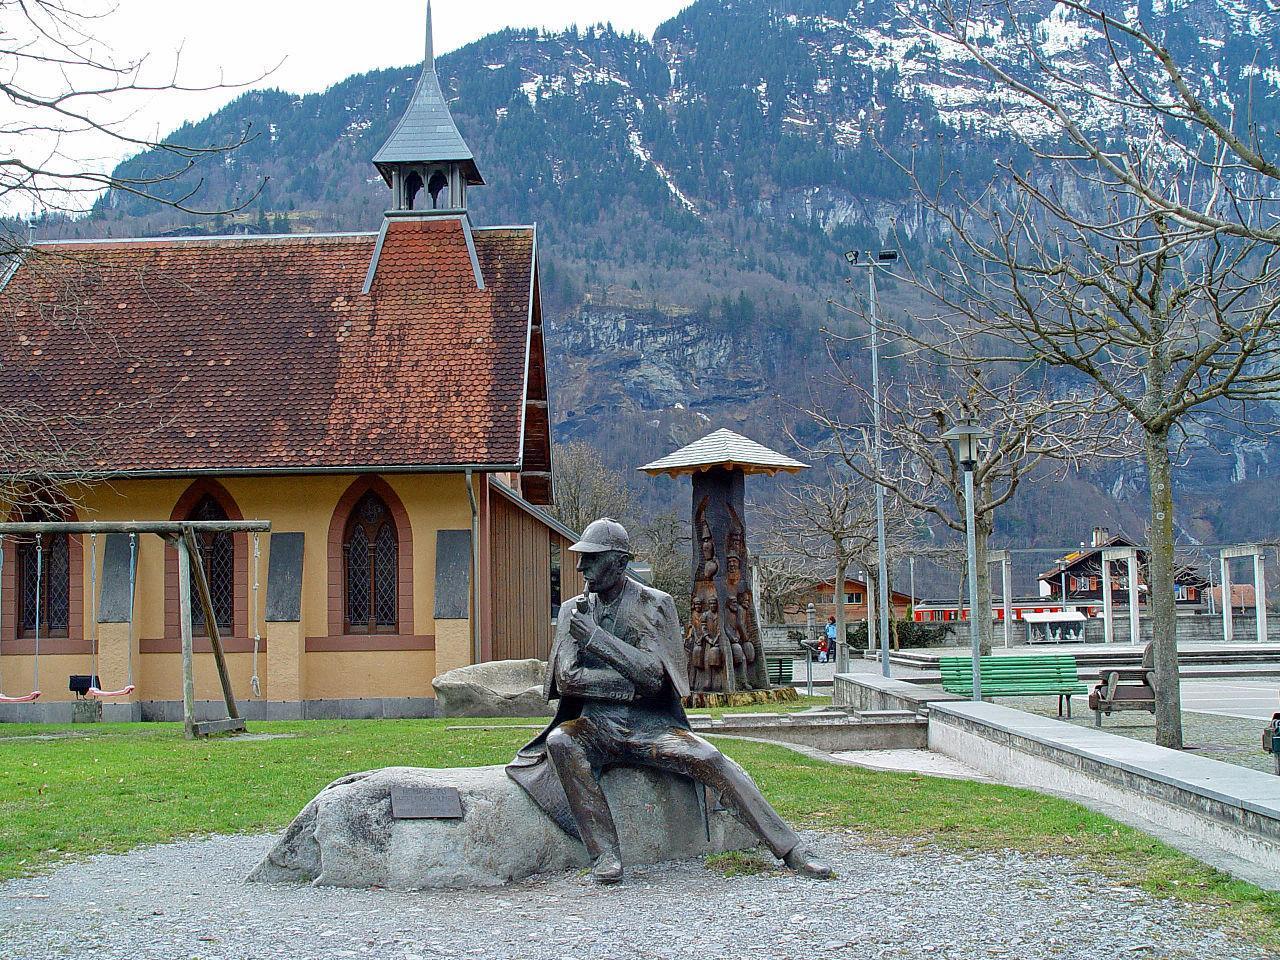 Ferienwohnung Mountain 4U (2605720), Meiringen, Meiringen - Hasliberg, Berner Oberland, Schweiz, Bild 20